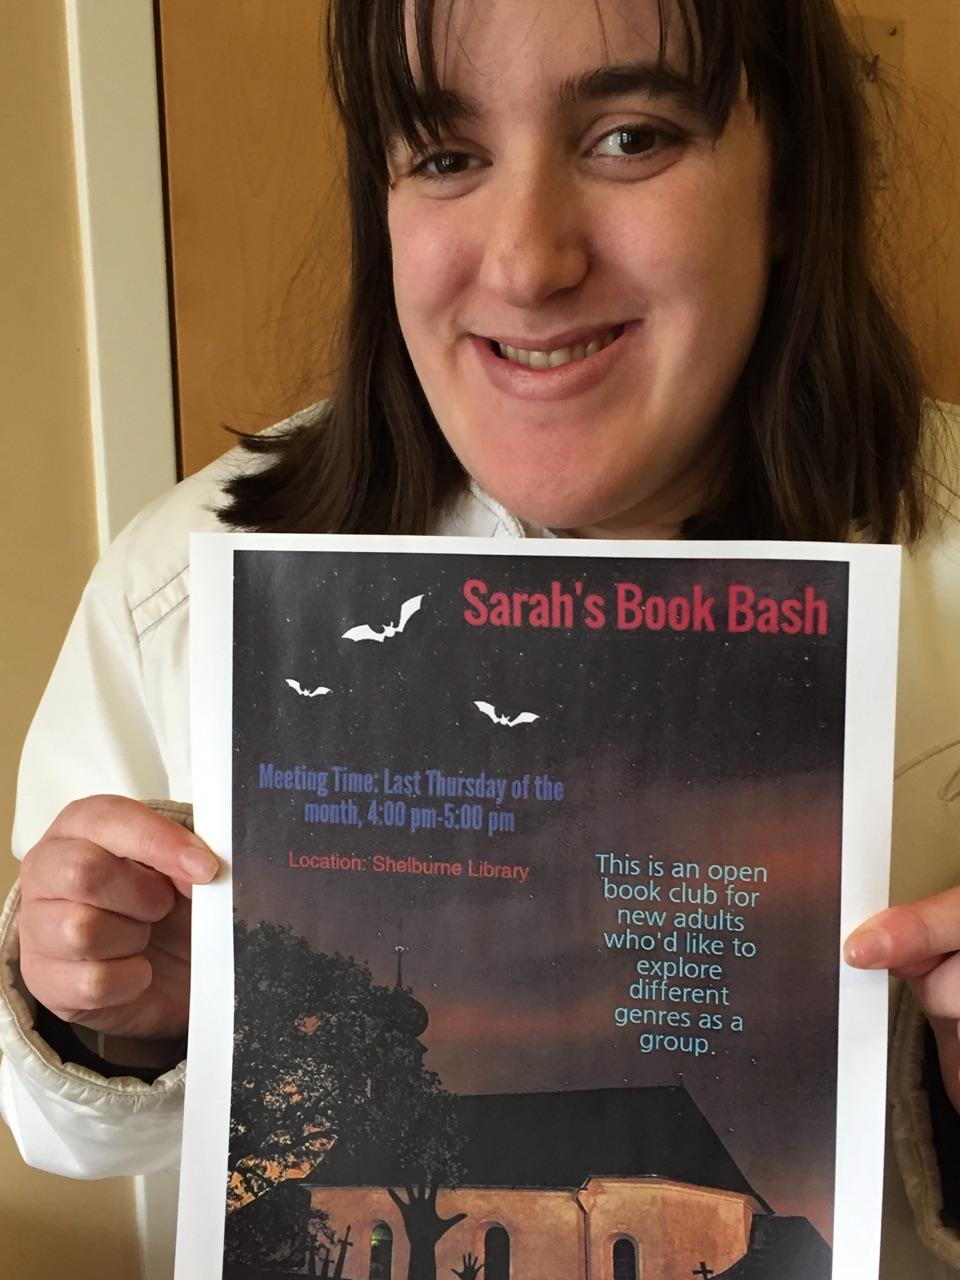 Sarah book club poster.png